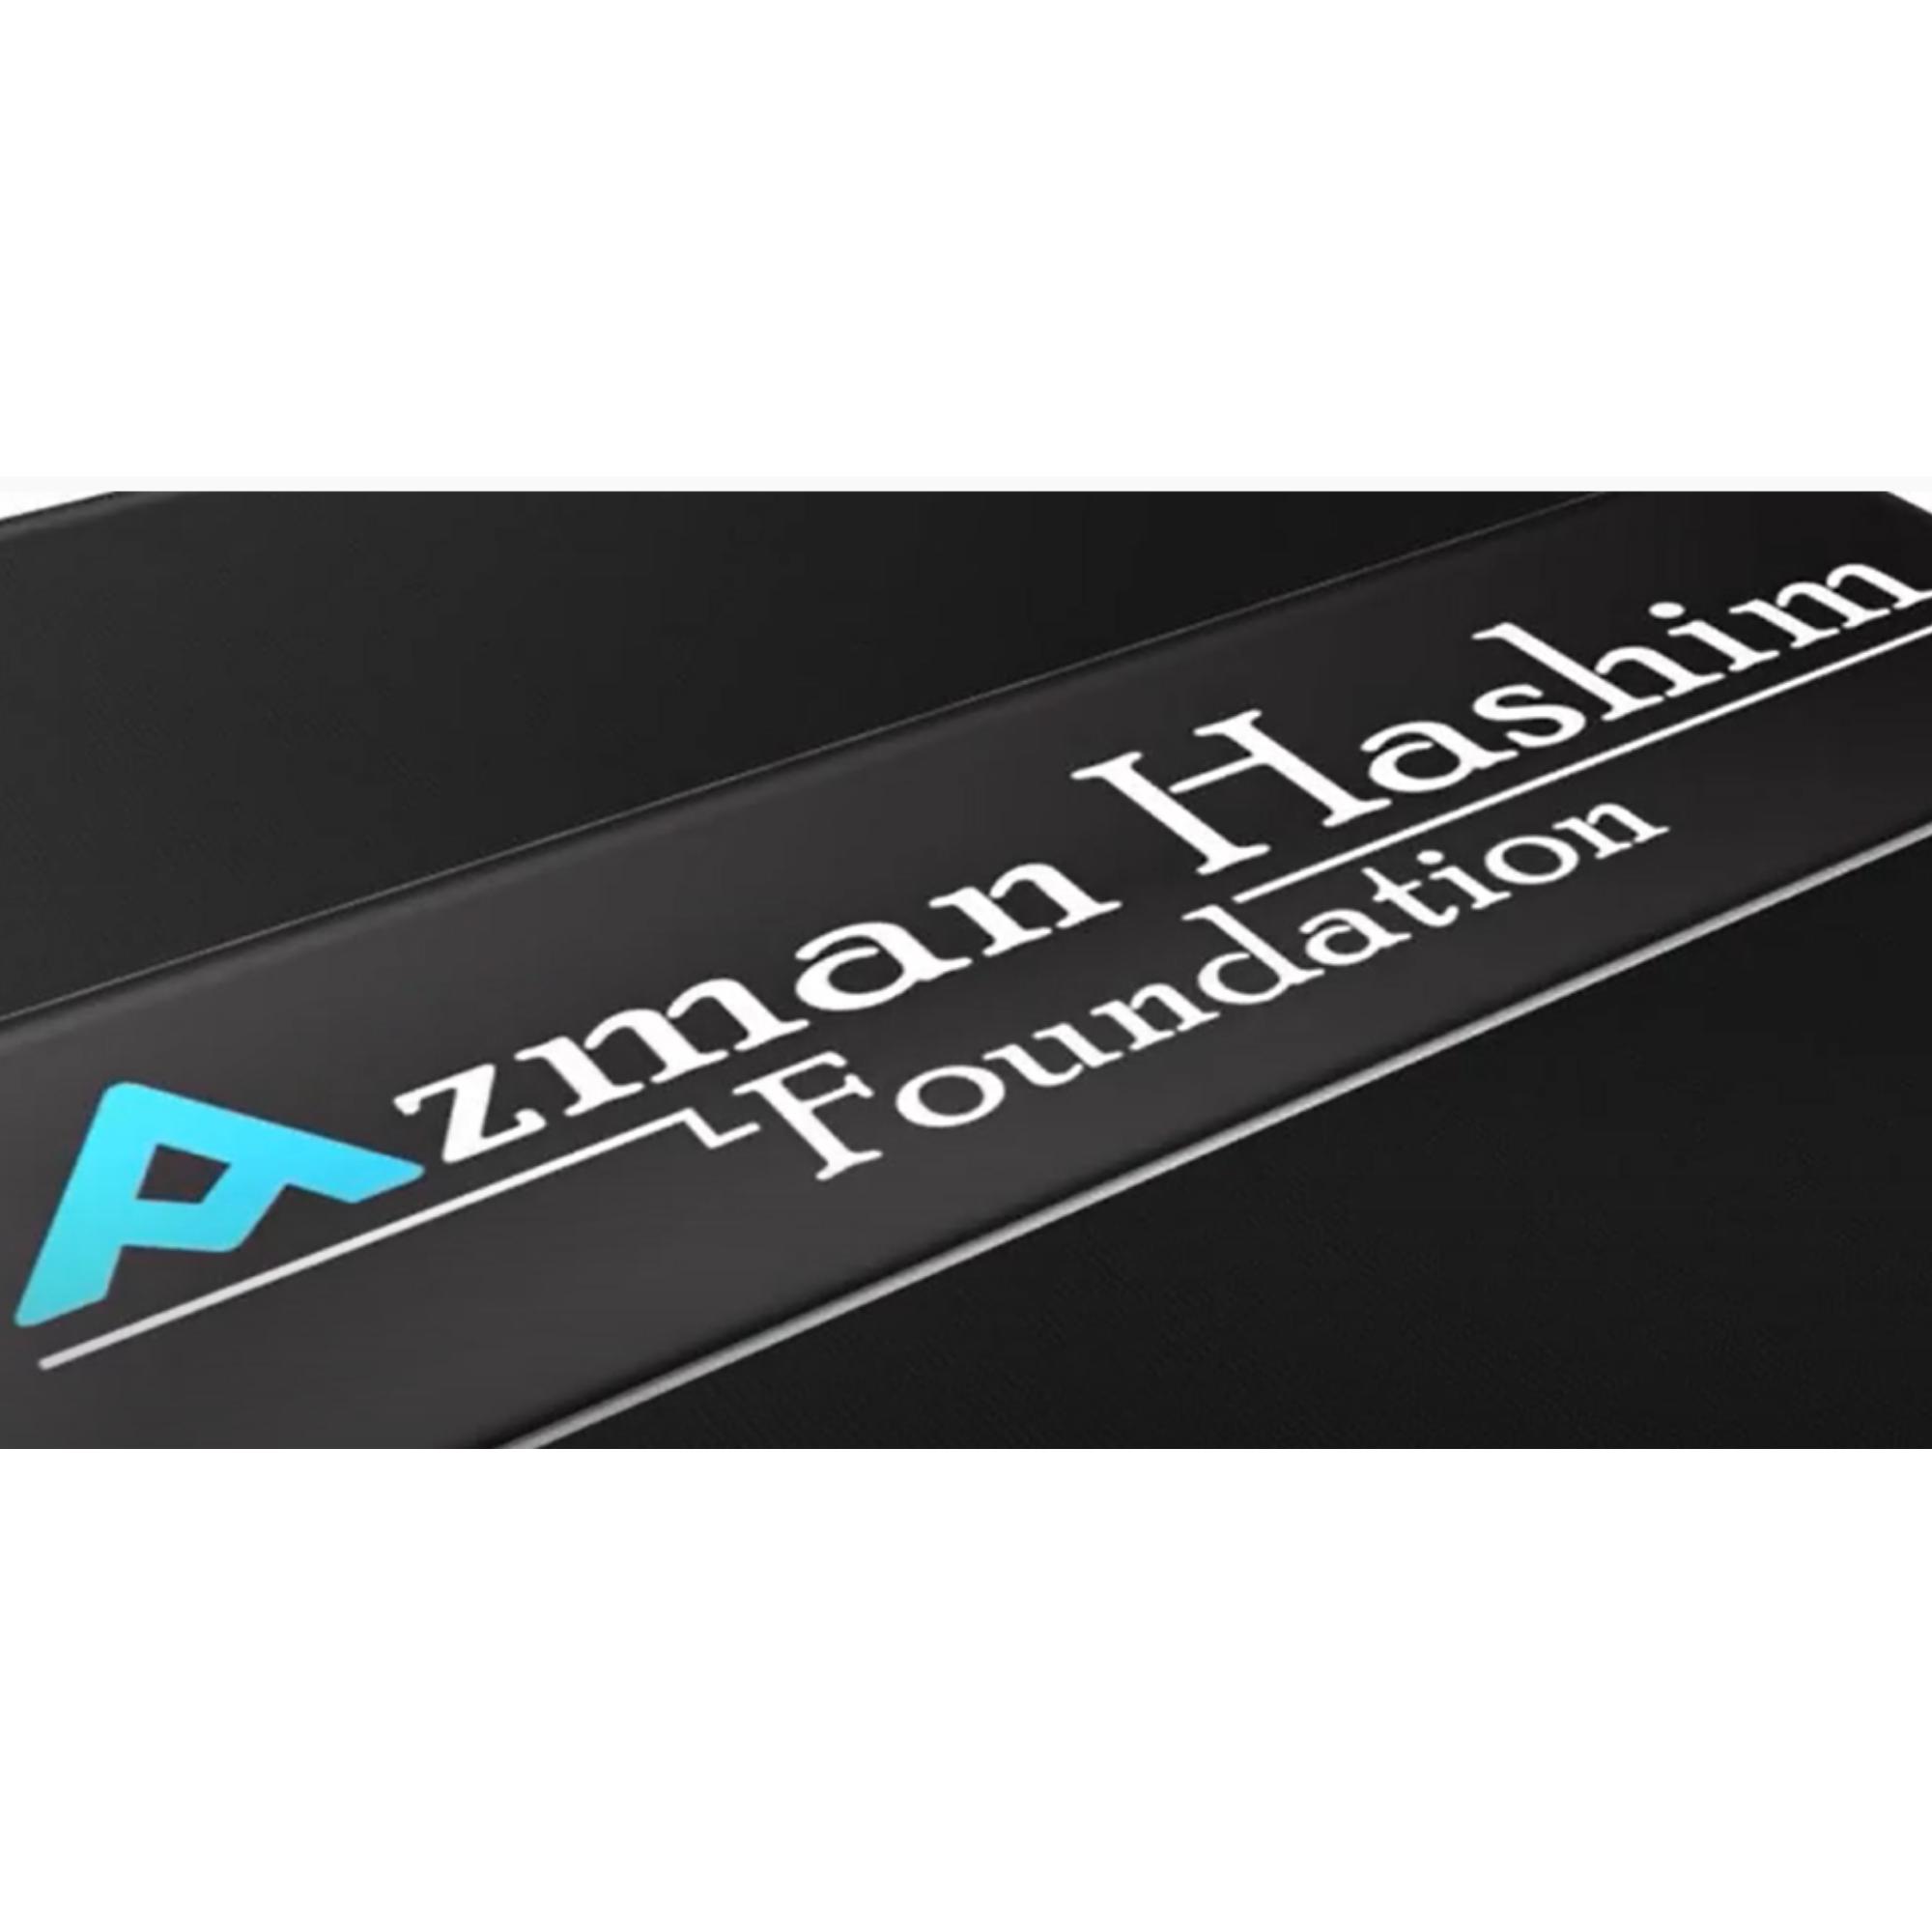 Read more about the article Inisiatif CSR Tan Sri Azman Hashim